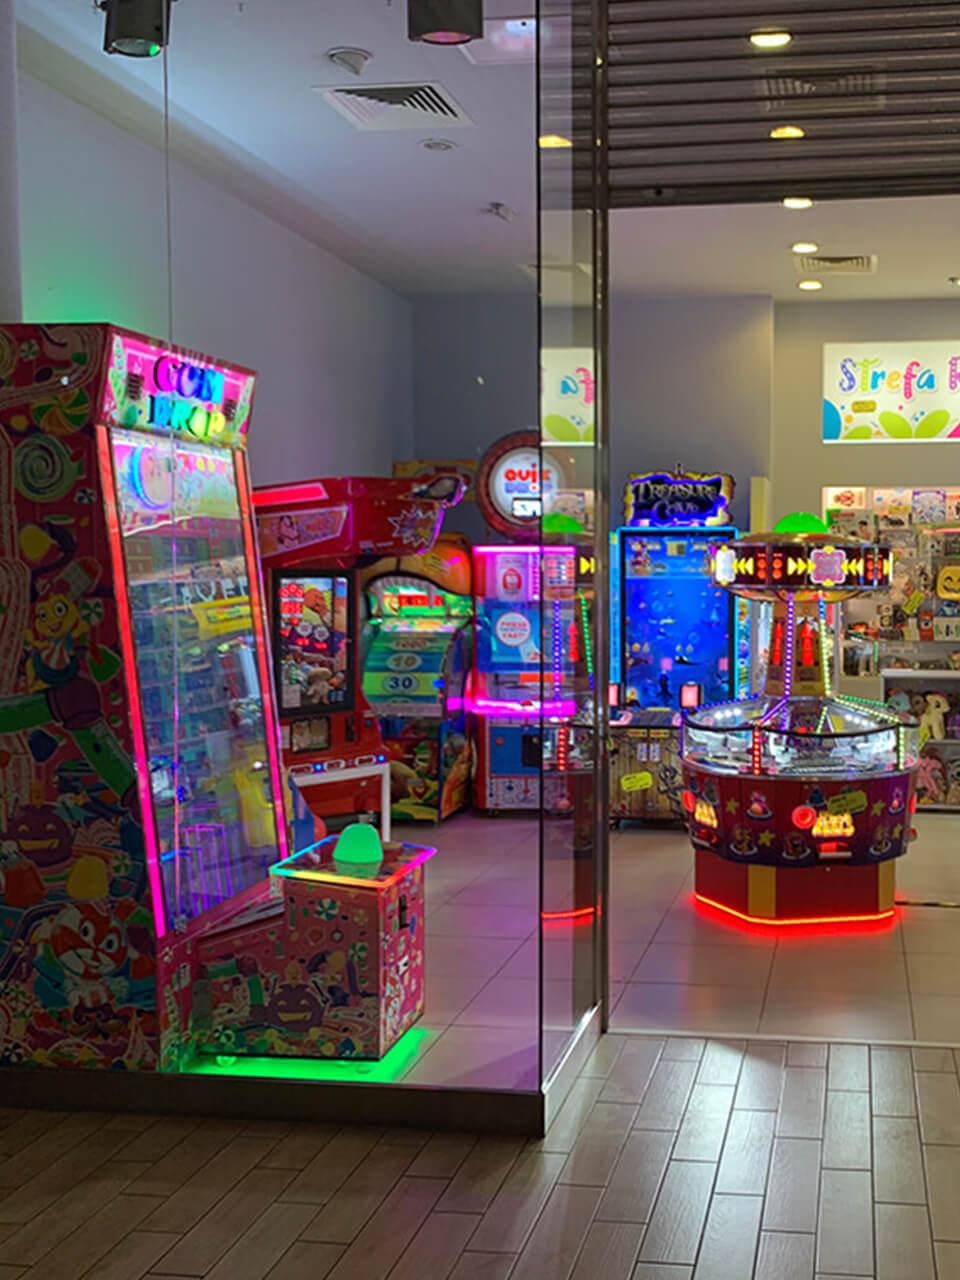 Game centers_Arcade Machines Africa